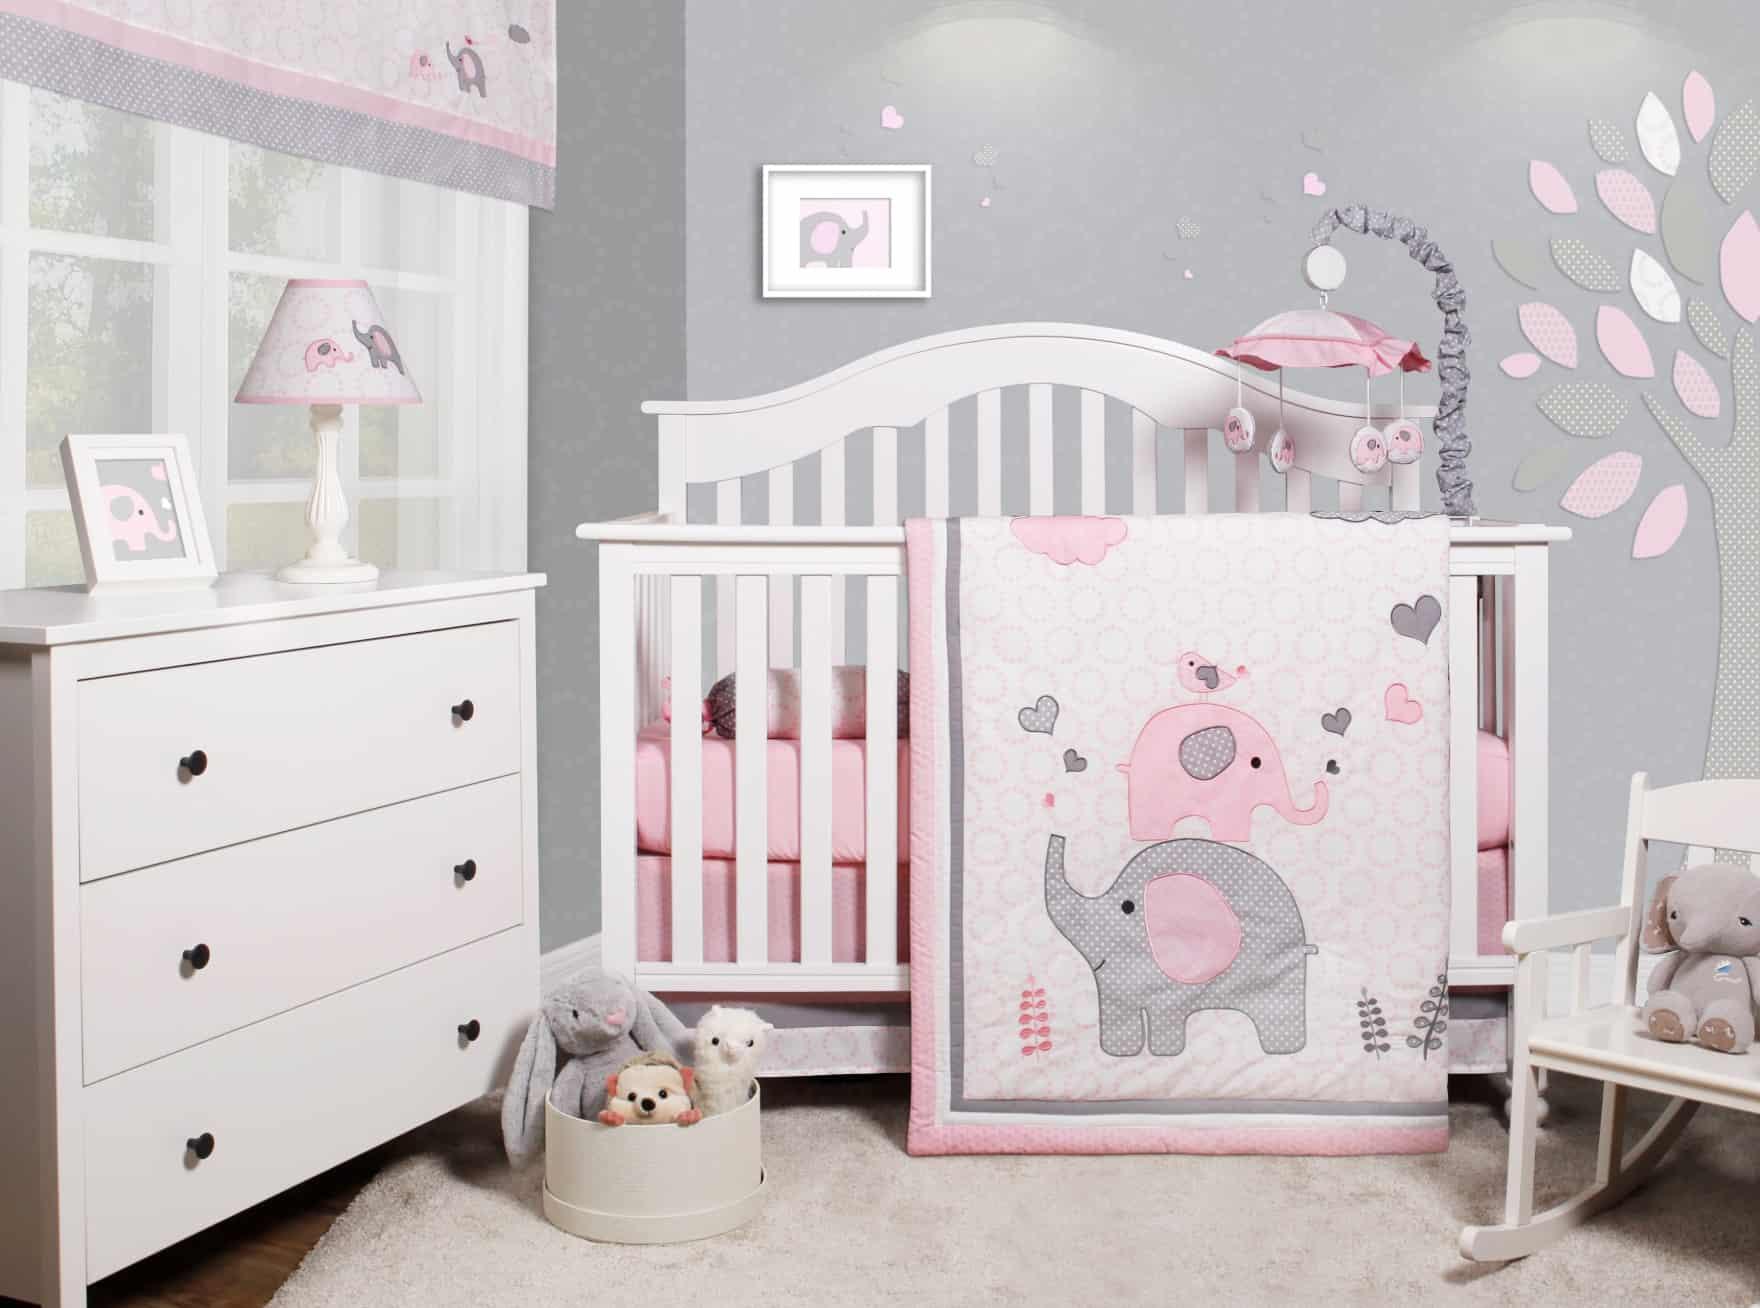 20 Cute Baby Girl Room Ideas on Simple But Cute Room Ideas  id=95601